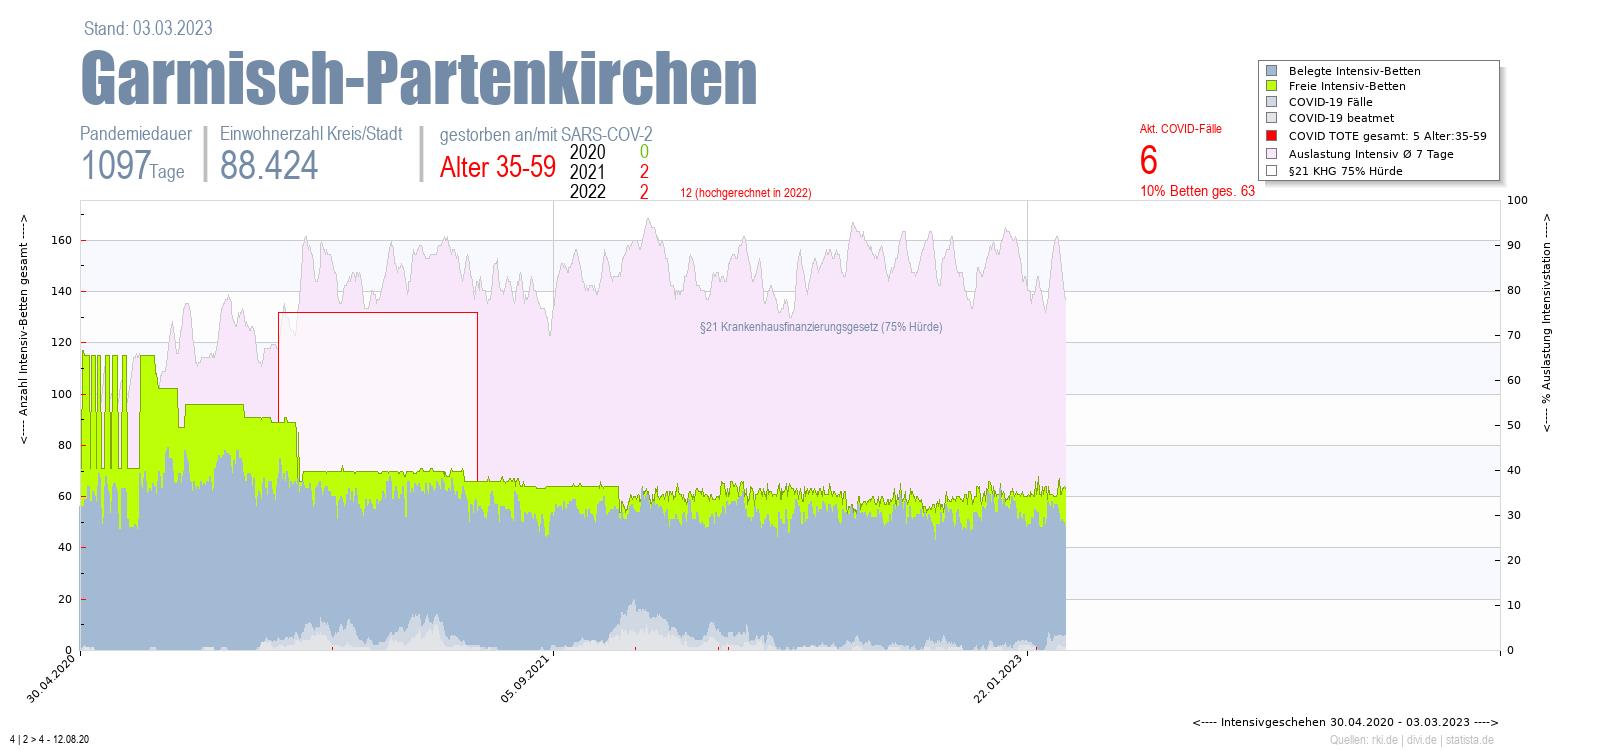 Intensivstation Auslastung Garmisch-Partenkirchen Alter 0-4